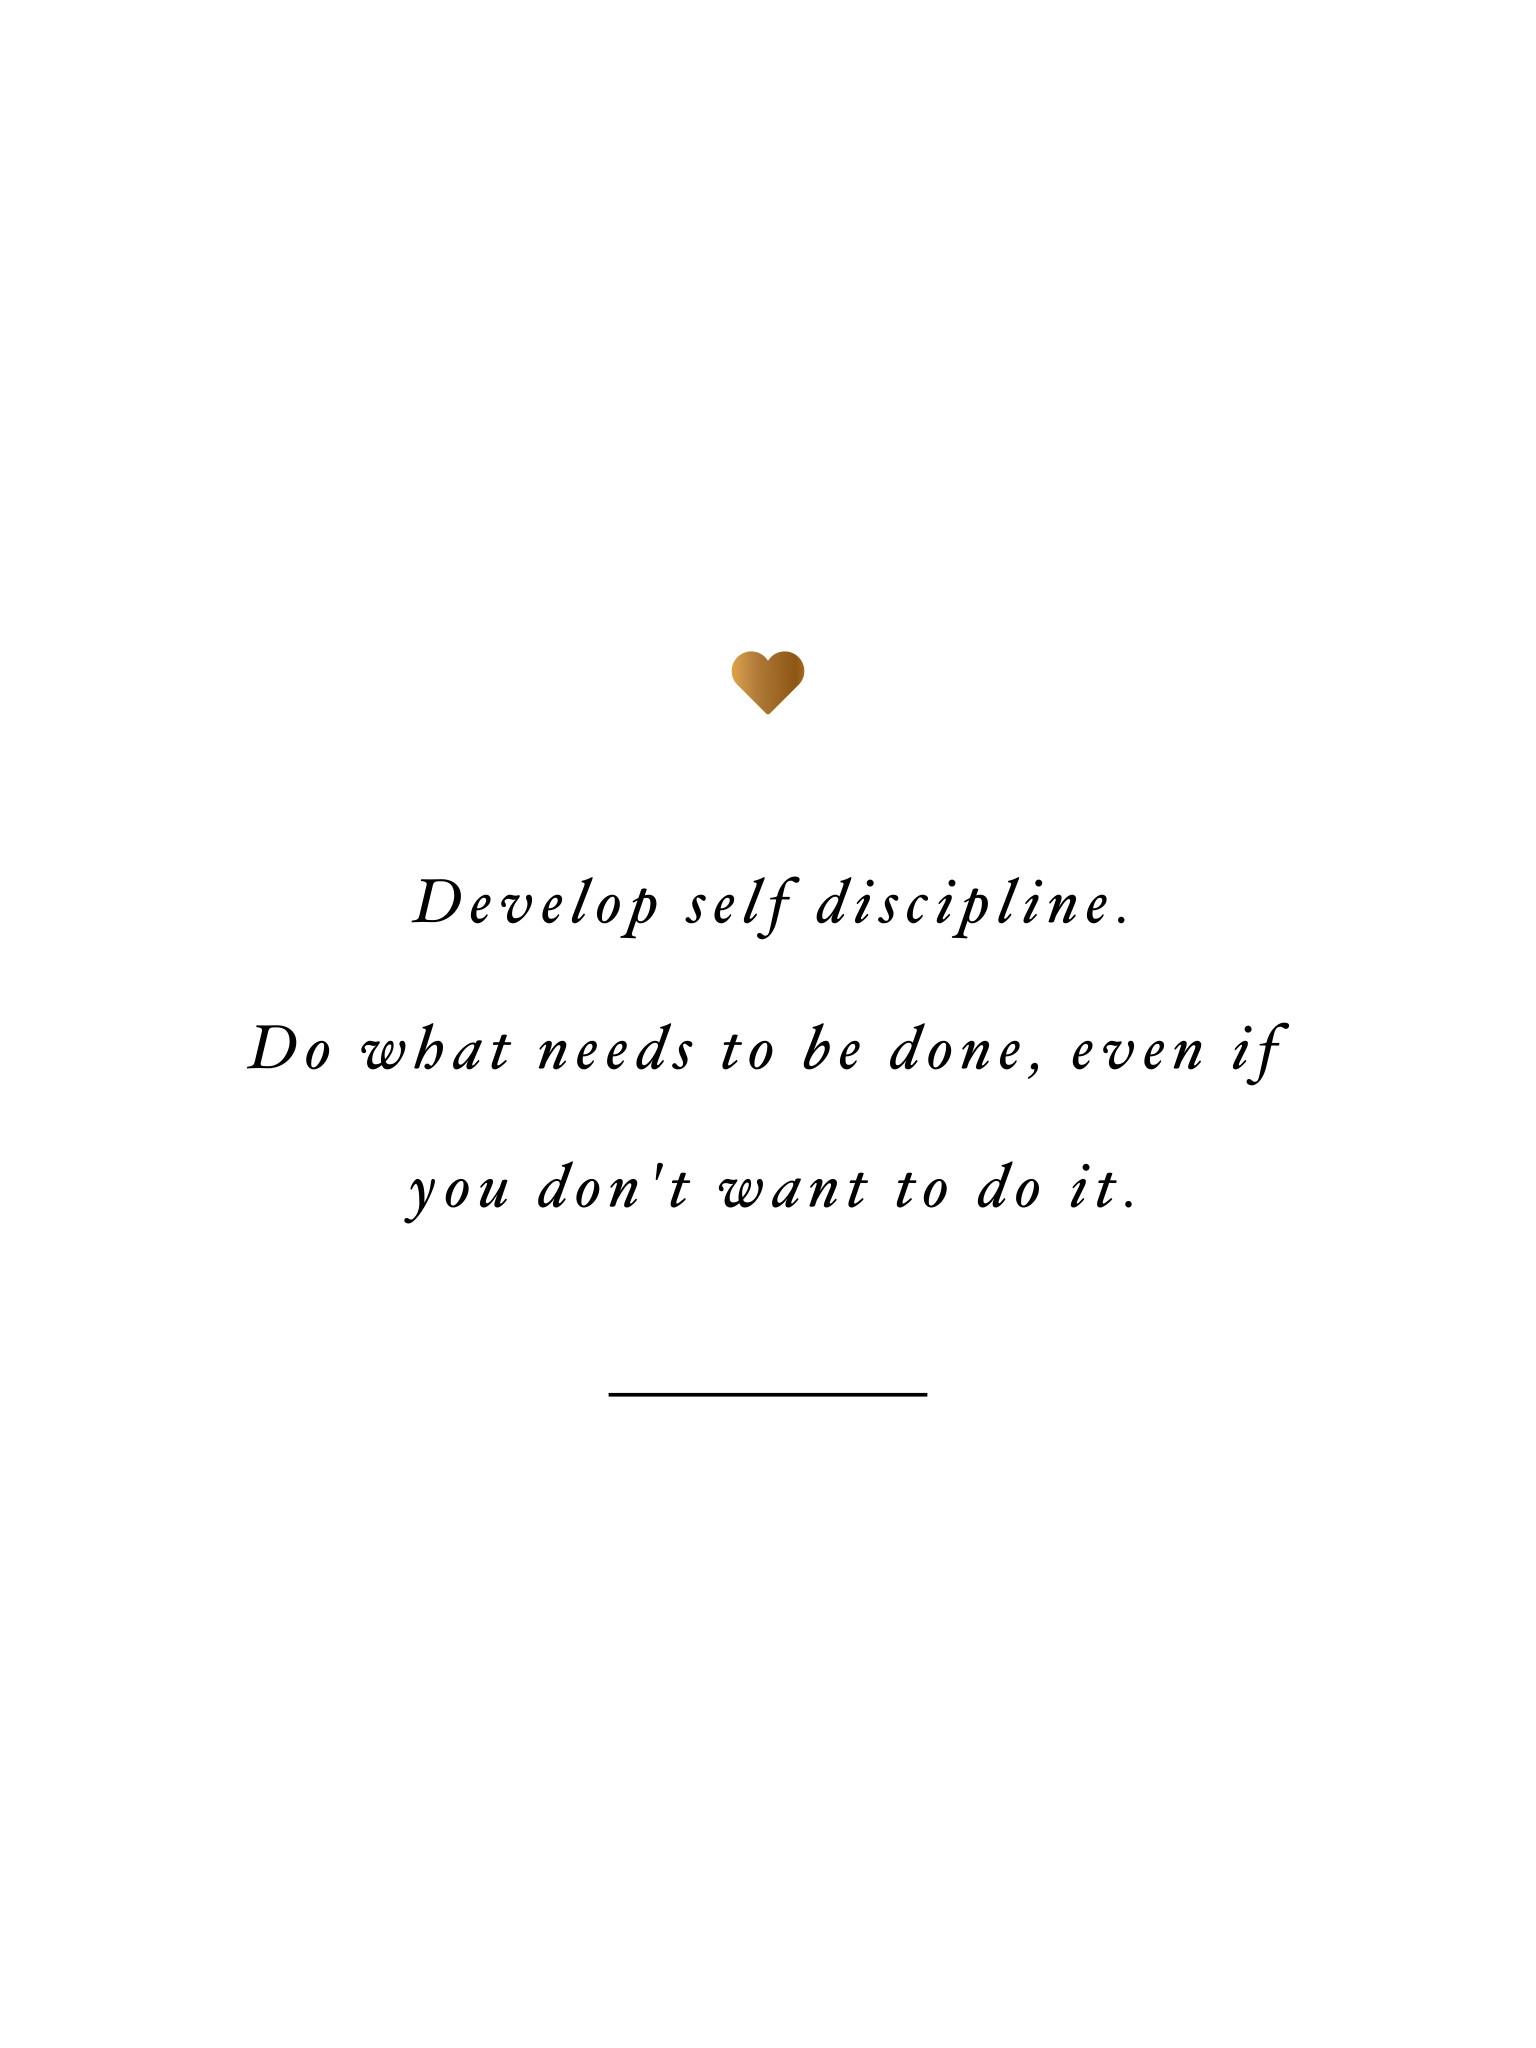 Self Motivation Quotes Wallpaper Develop Self Discipline Inspirational Wallpapers